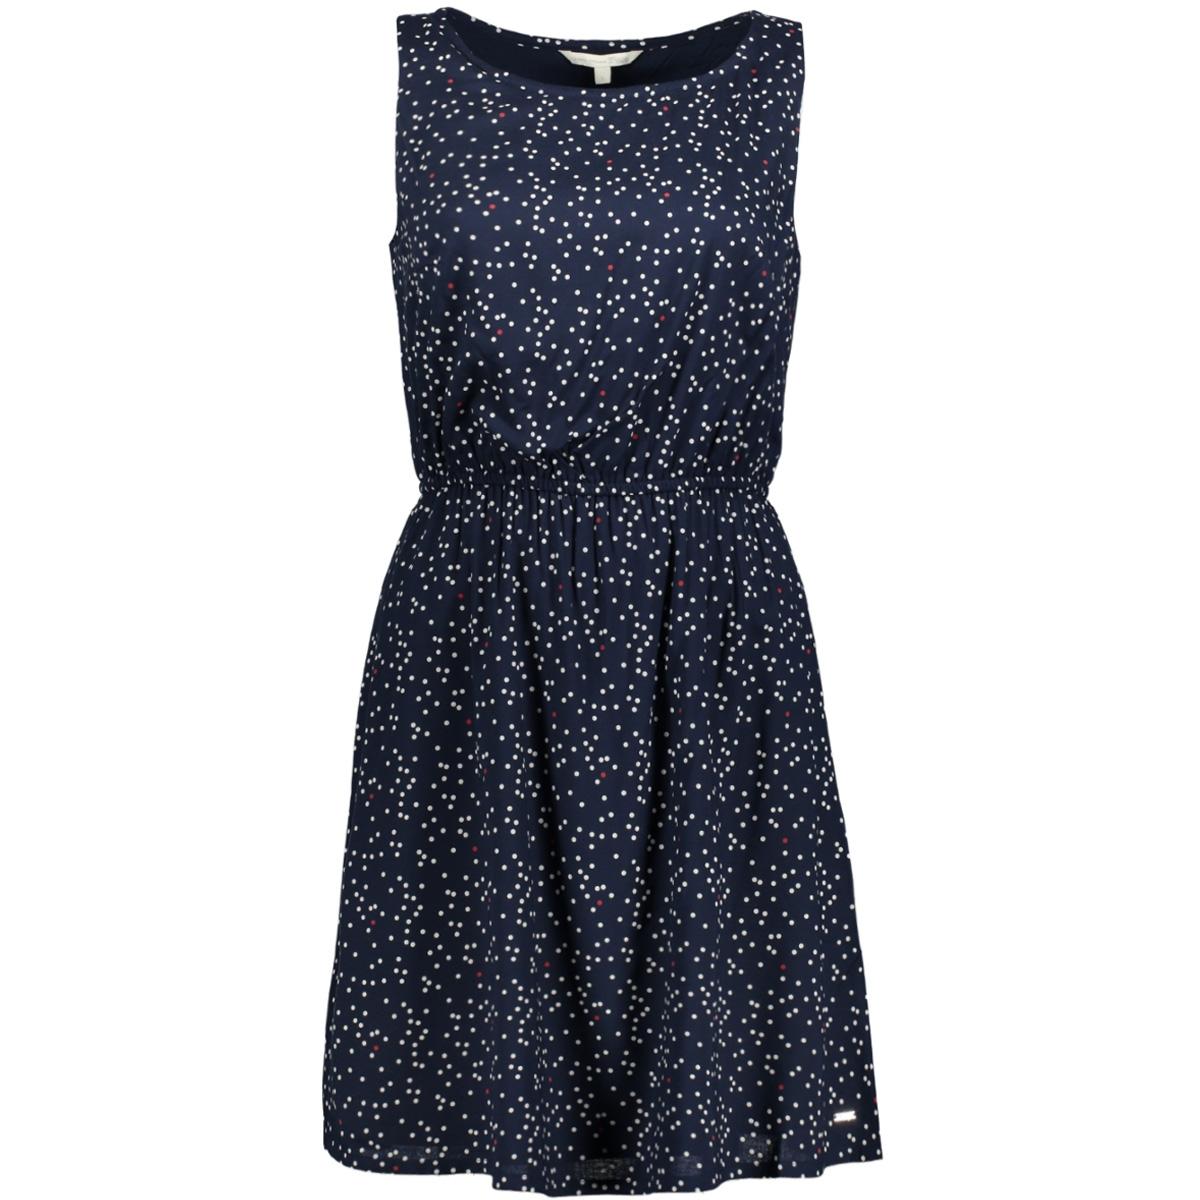 5055038.09.71 tom tailor jurk 6416